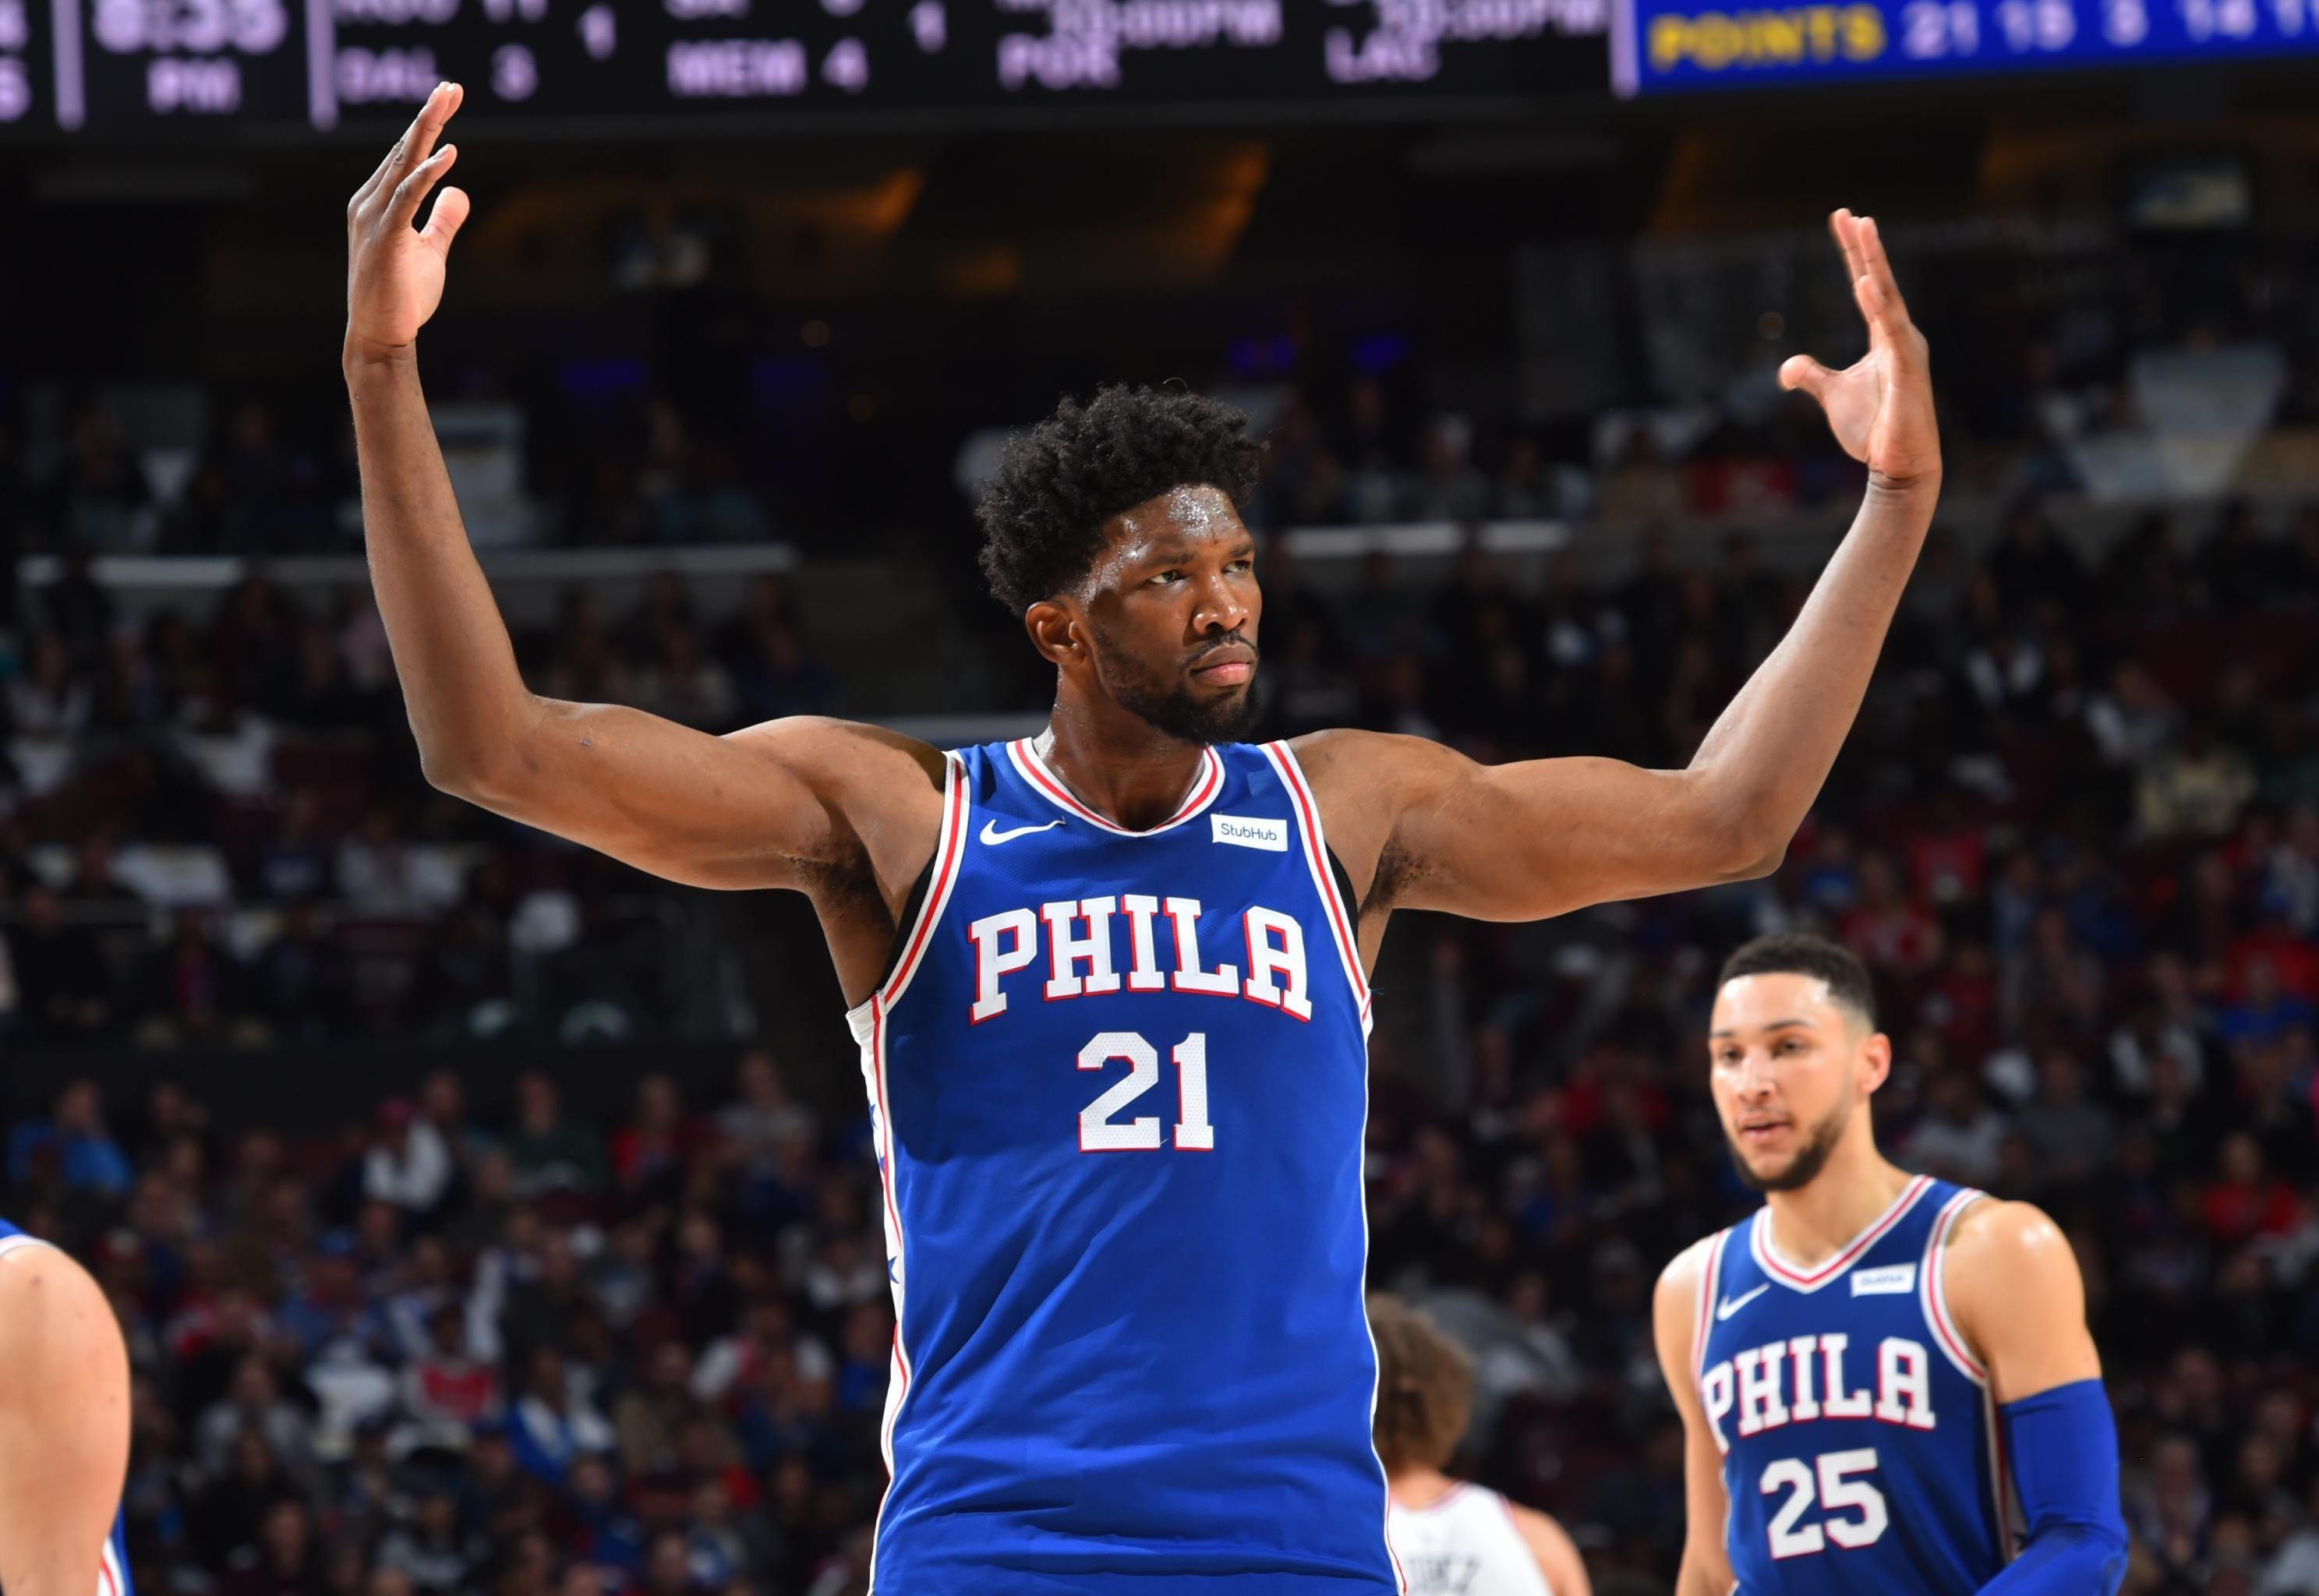 Nba Power Rankings Joel Embiid Has Philadelphia 76ers